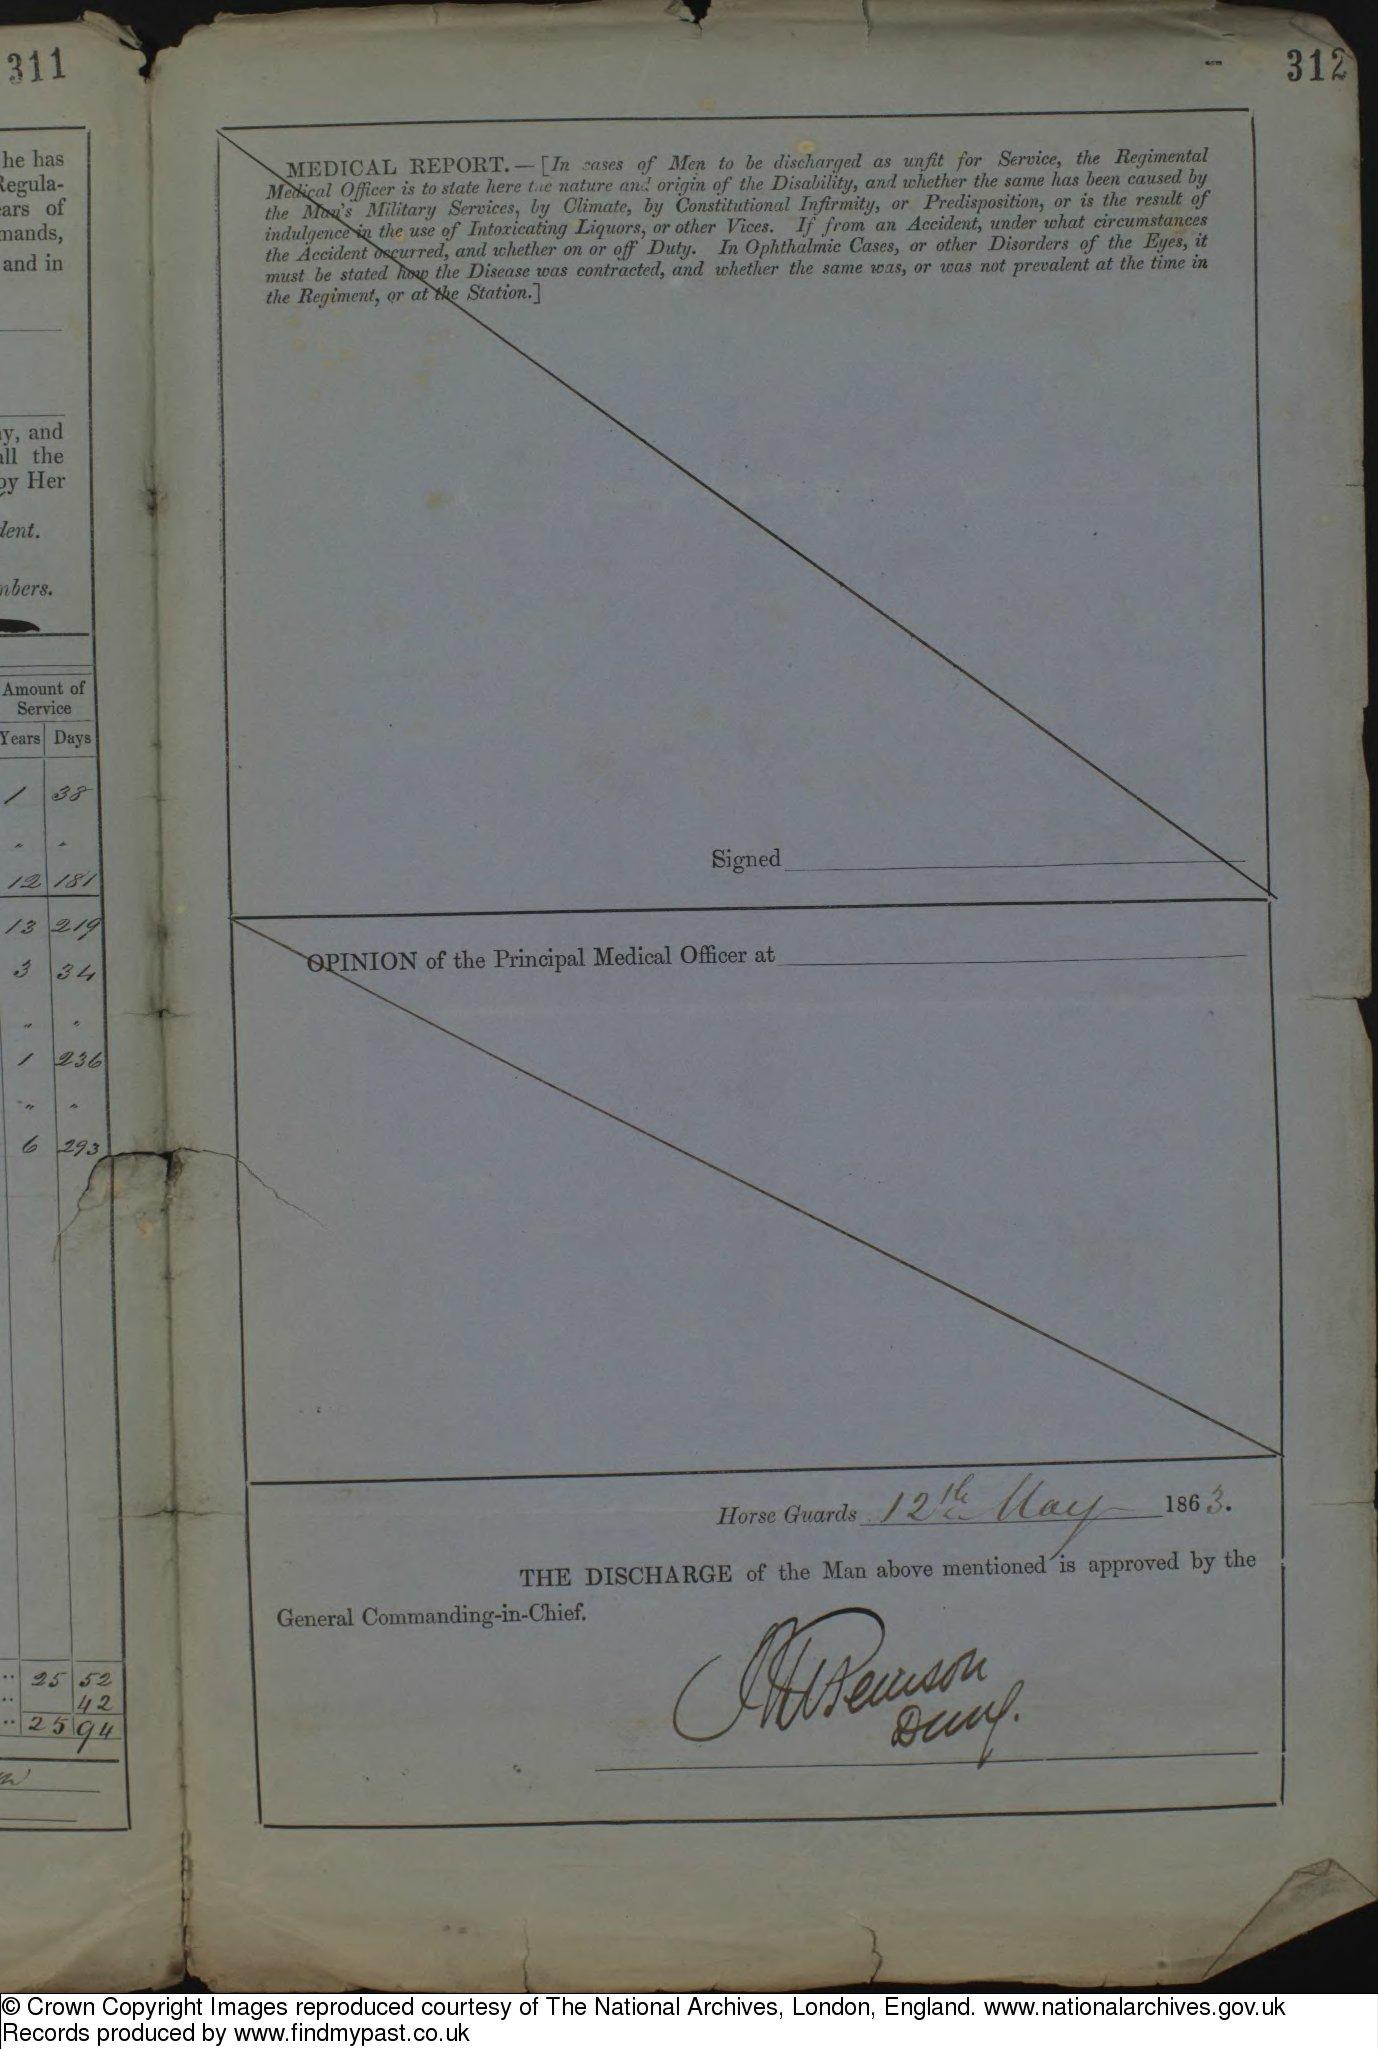 Image 3: Patrick McCann Discharge Royal Canadian Regiment of Rifles 1863